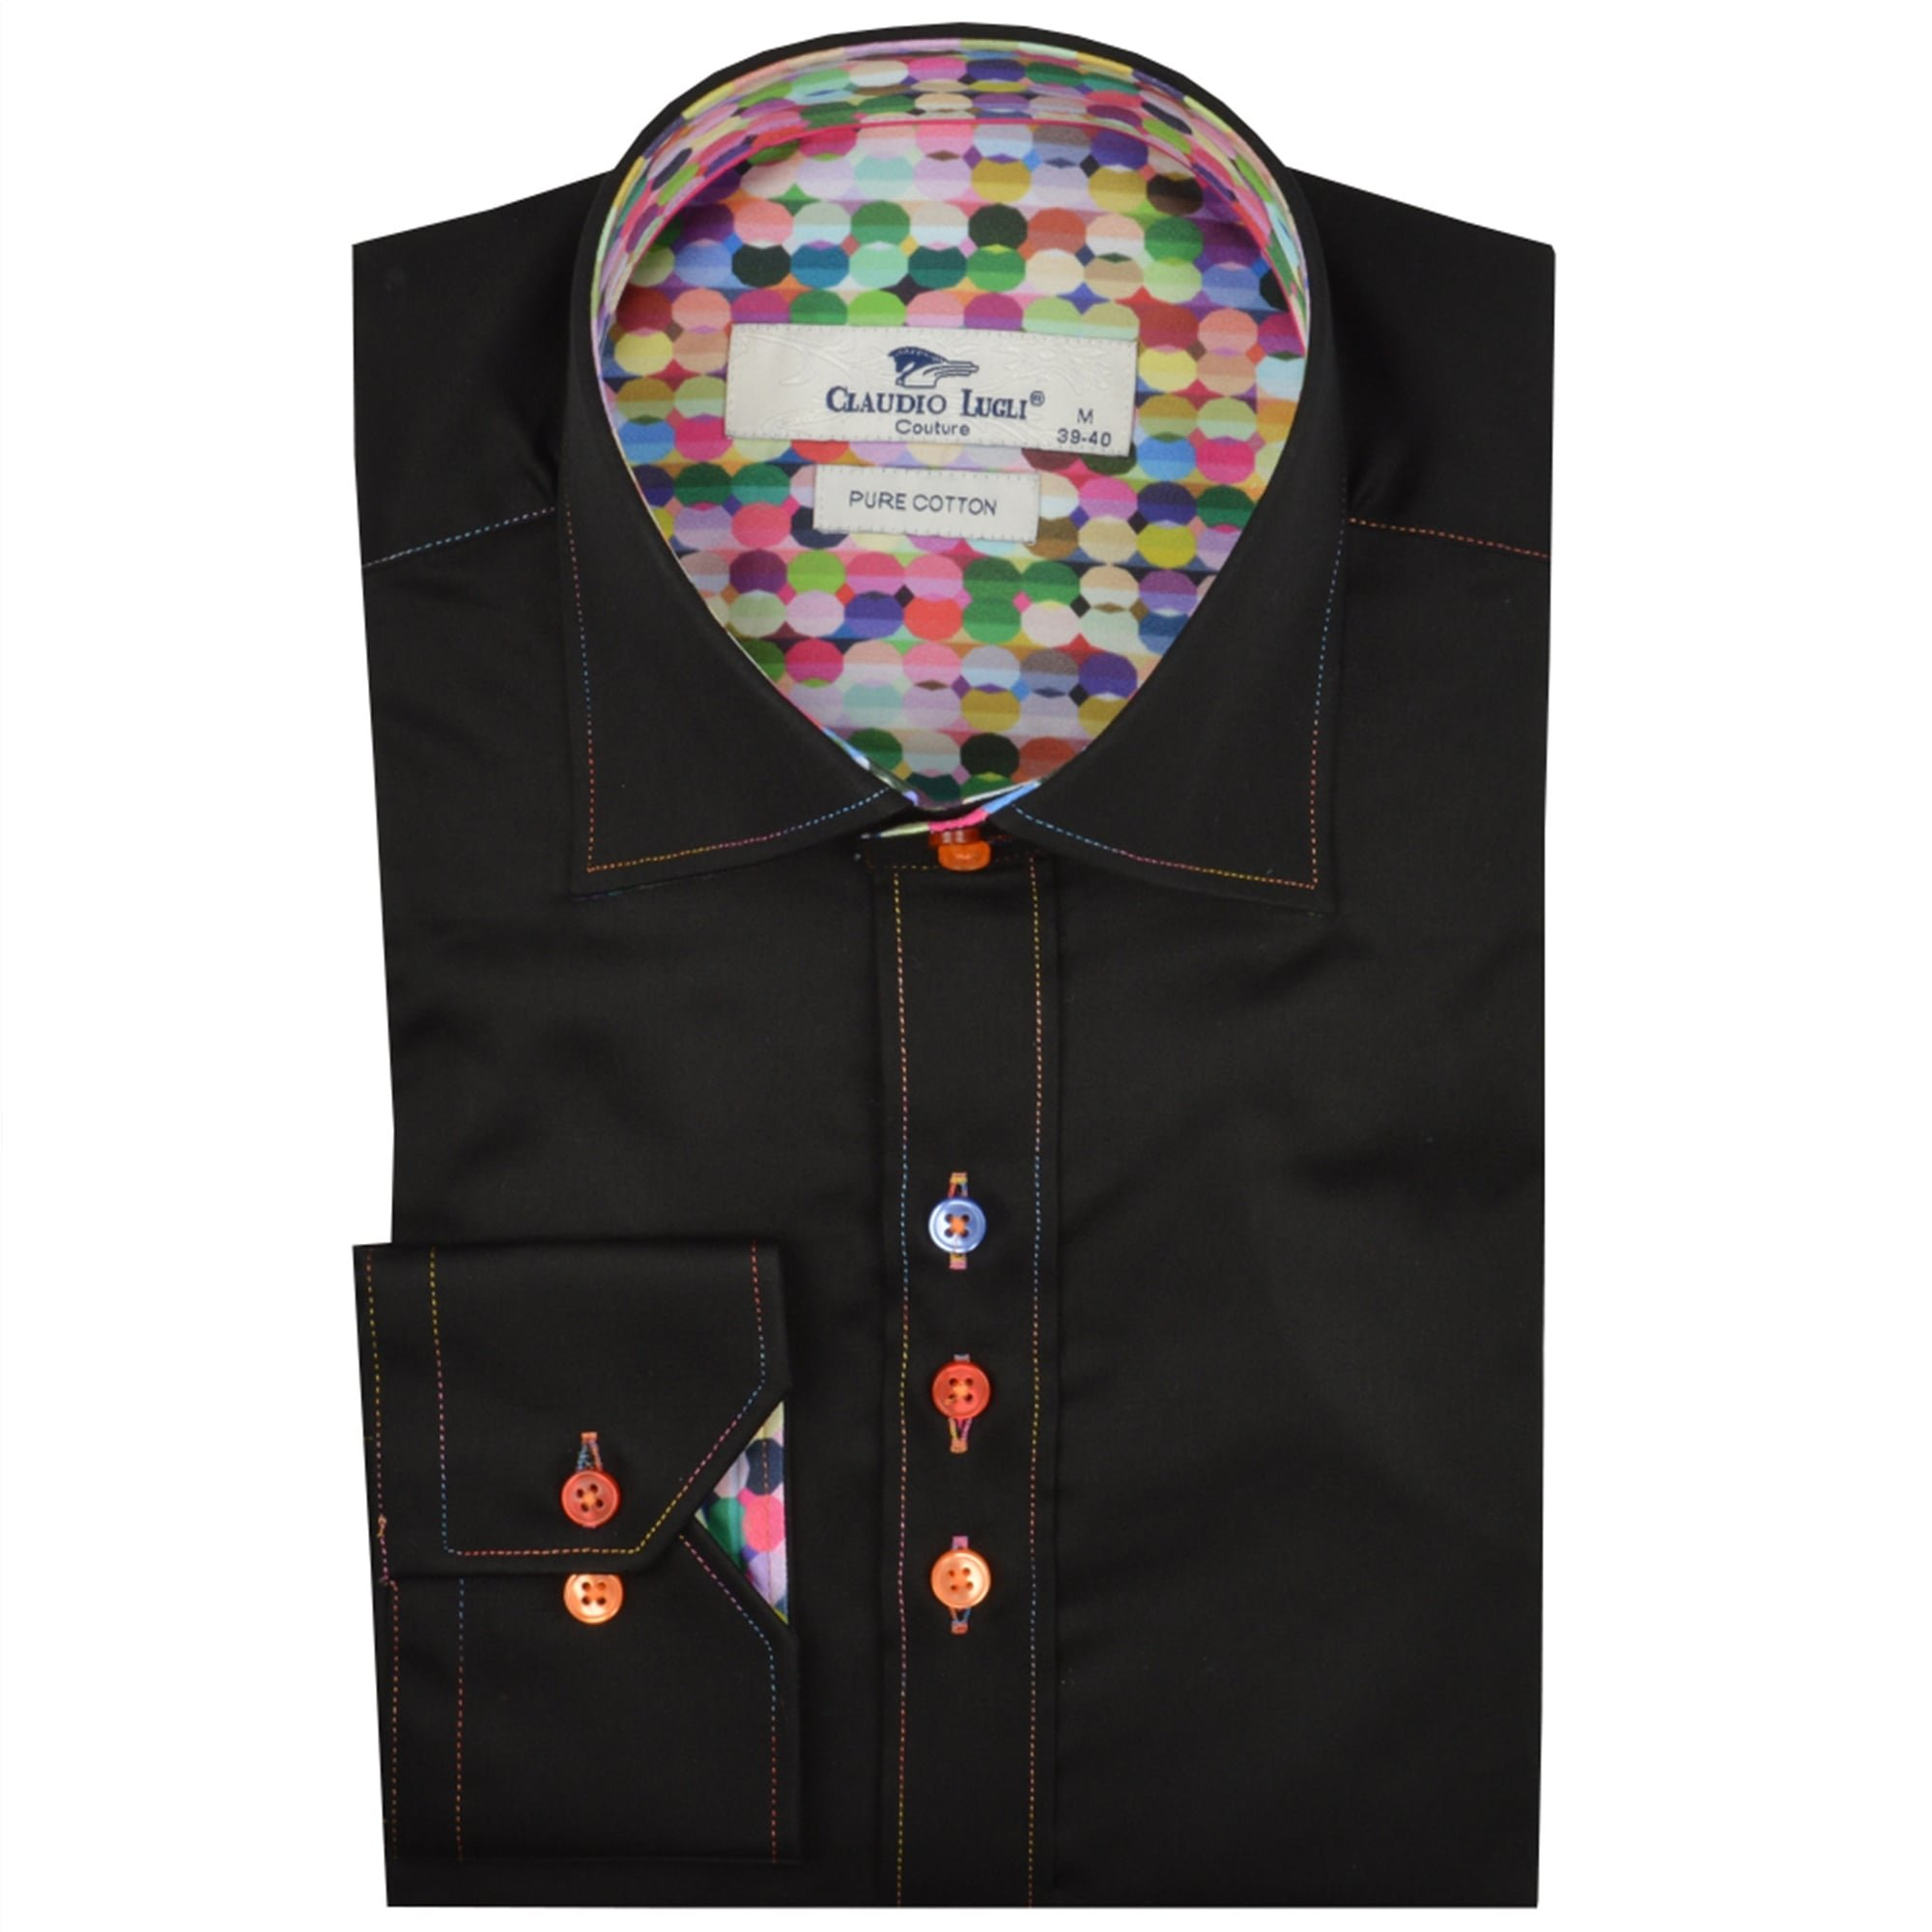 Claudio Lugli Balloon Print Trim Mens Shirt Luxury Long Sleeve Casual Party Wedding Cotton CP6229 2XLarge Black